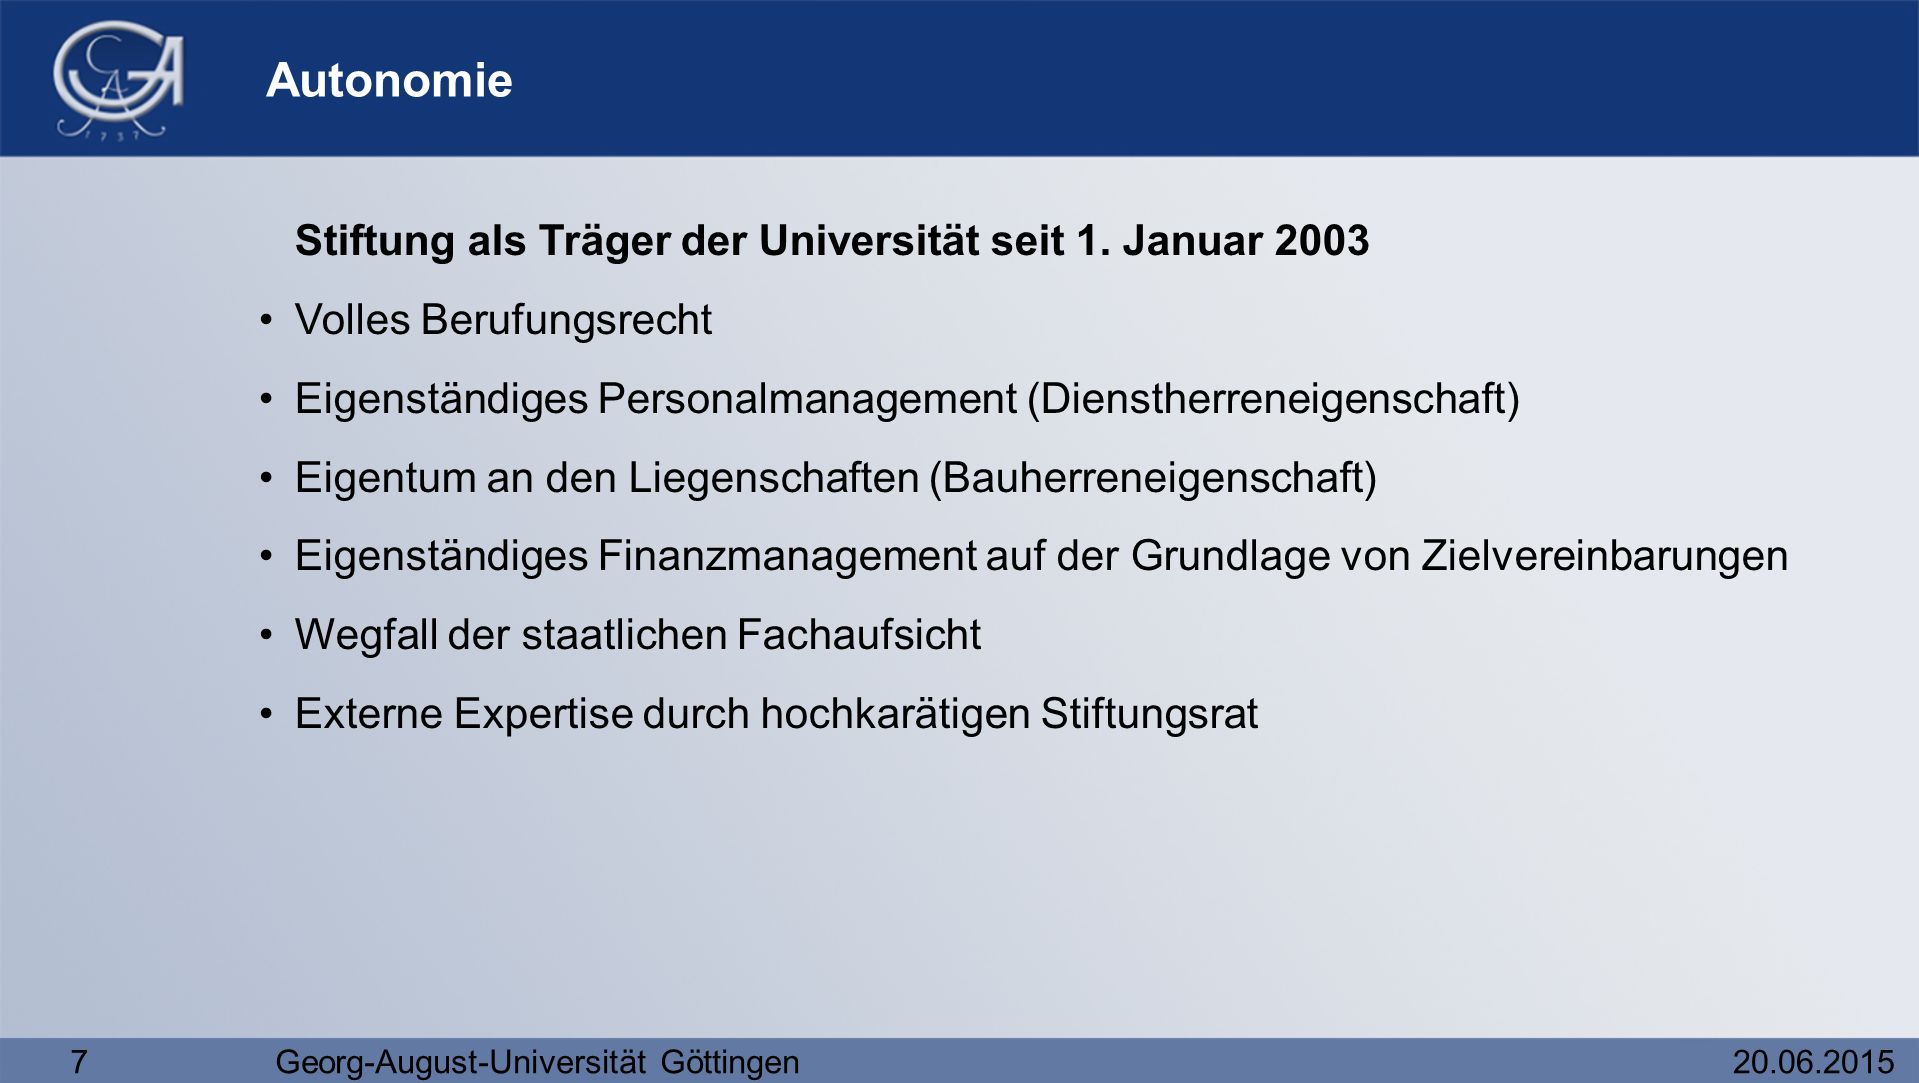 Georg-August-Universität Göttingen